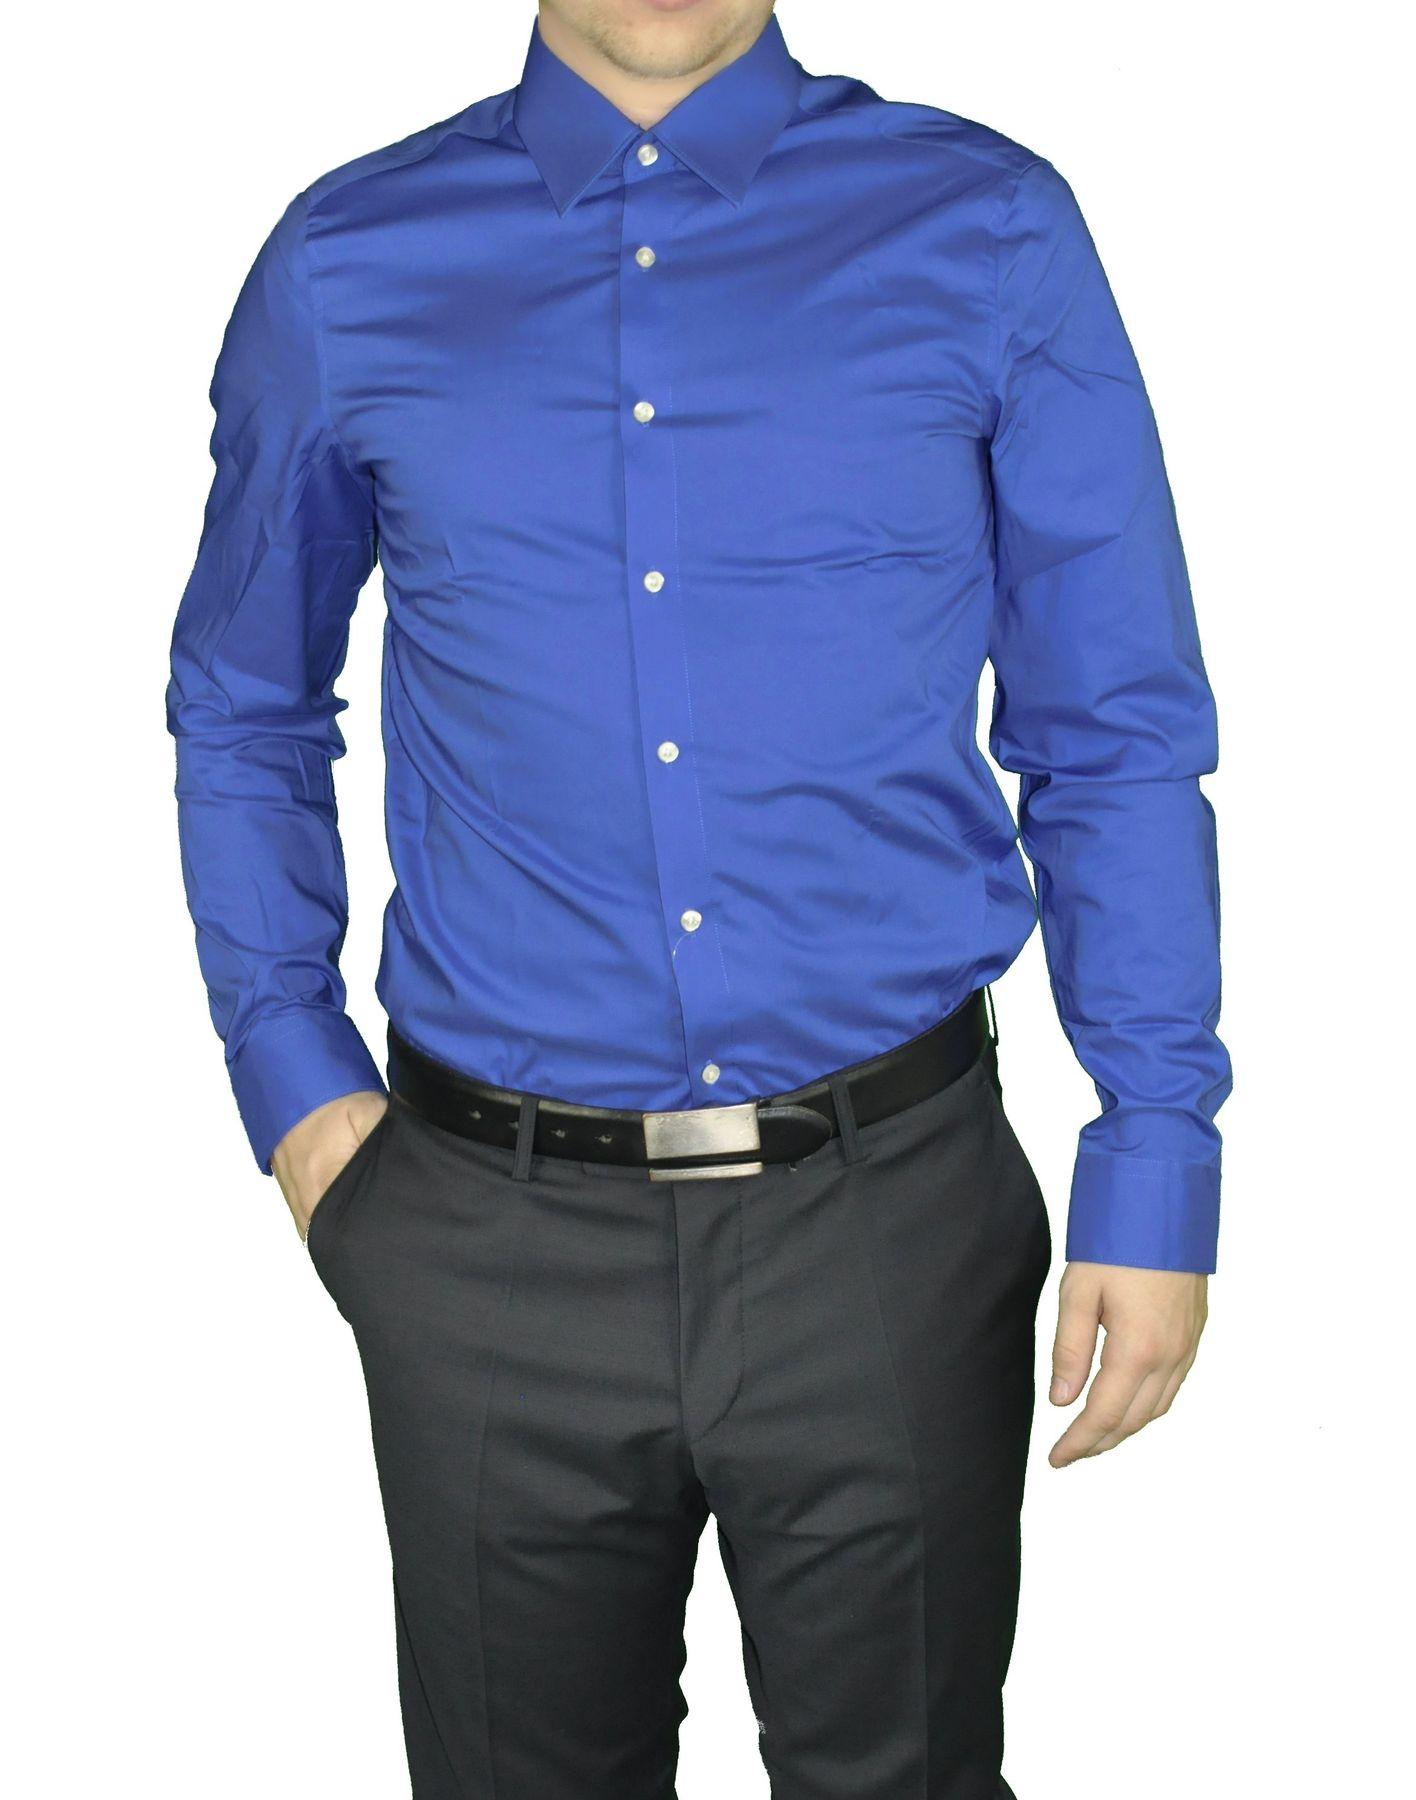 Redmond - Herren Slim Fit Hemd in verschiedenen Farben (400130/17A) – Bild 3